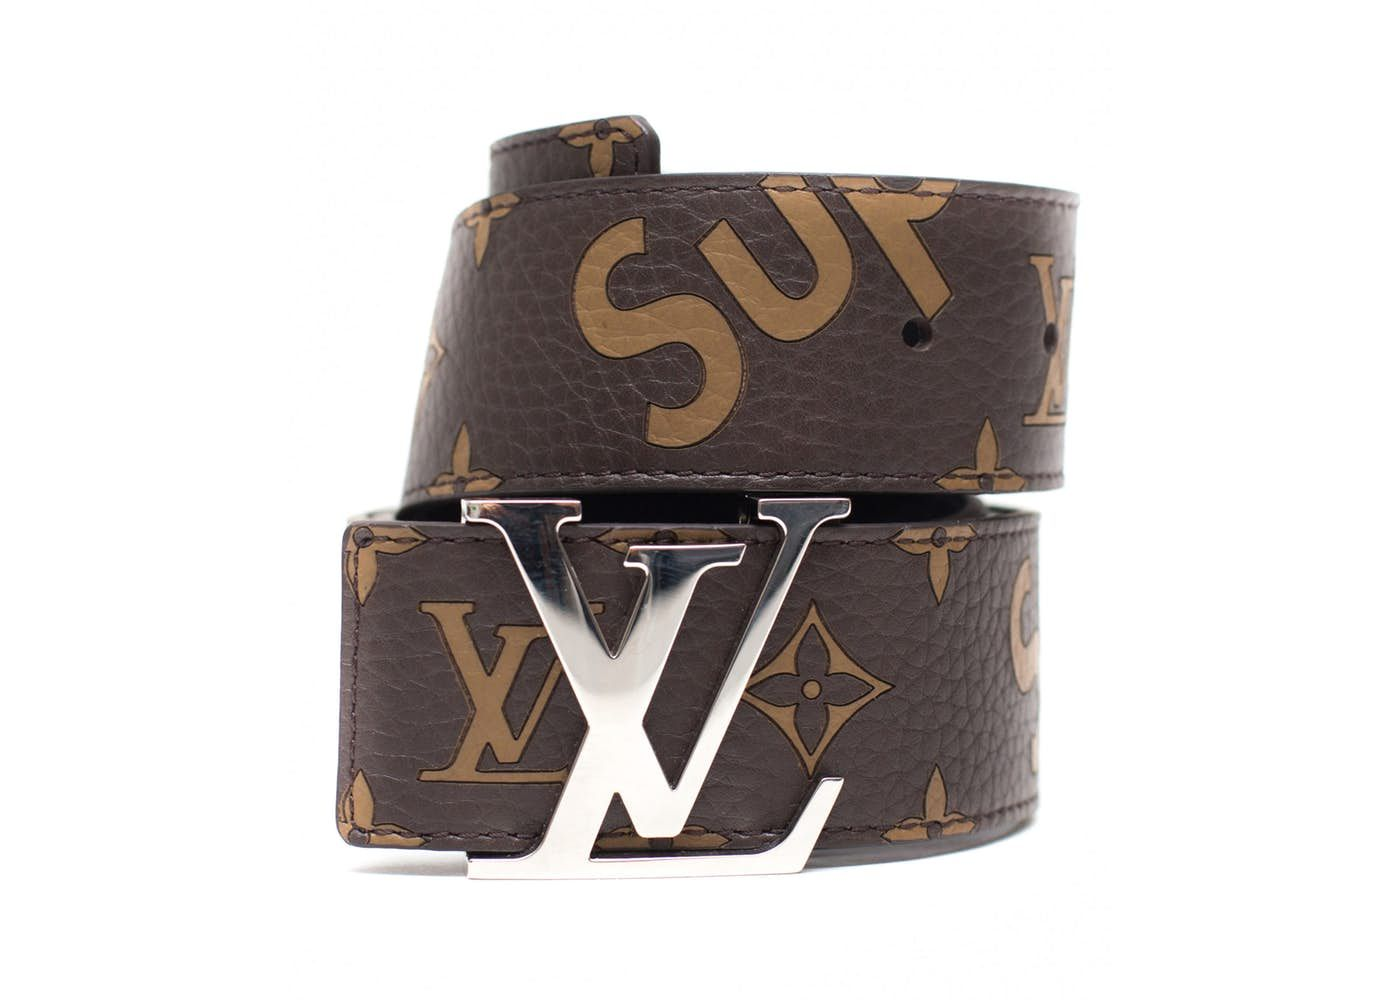 Louis Vuitton x Supreme Initiales Belt 40 MM Monogram